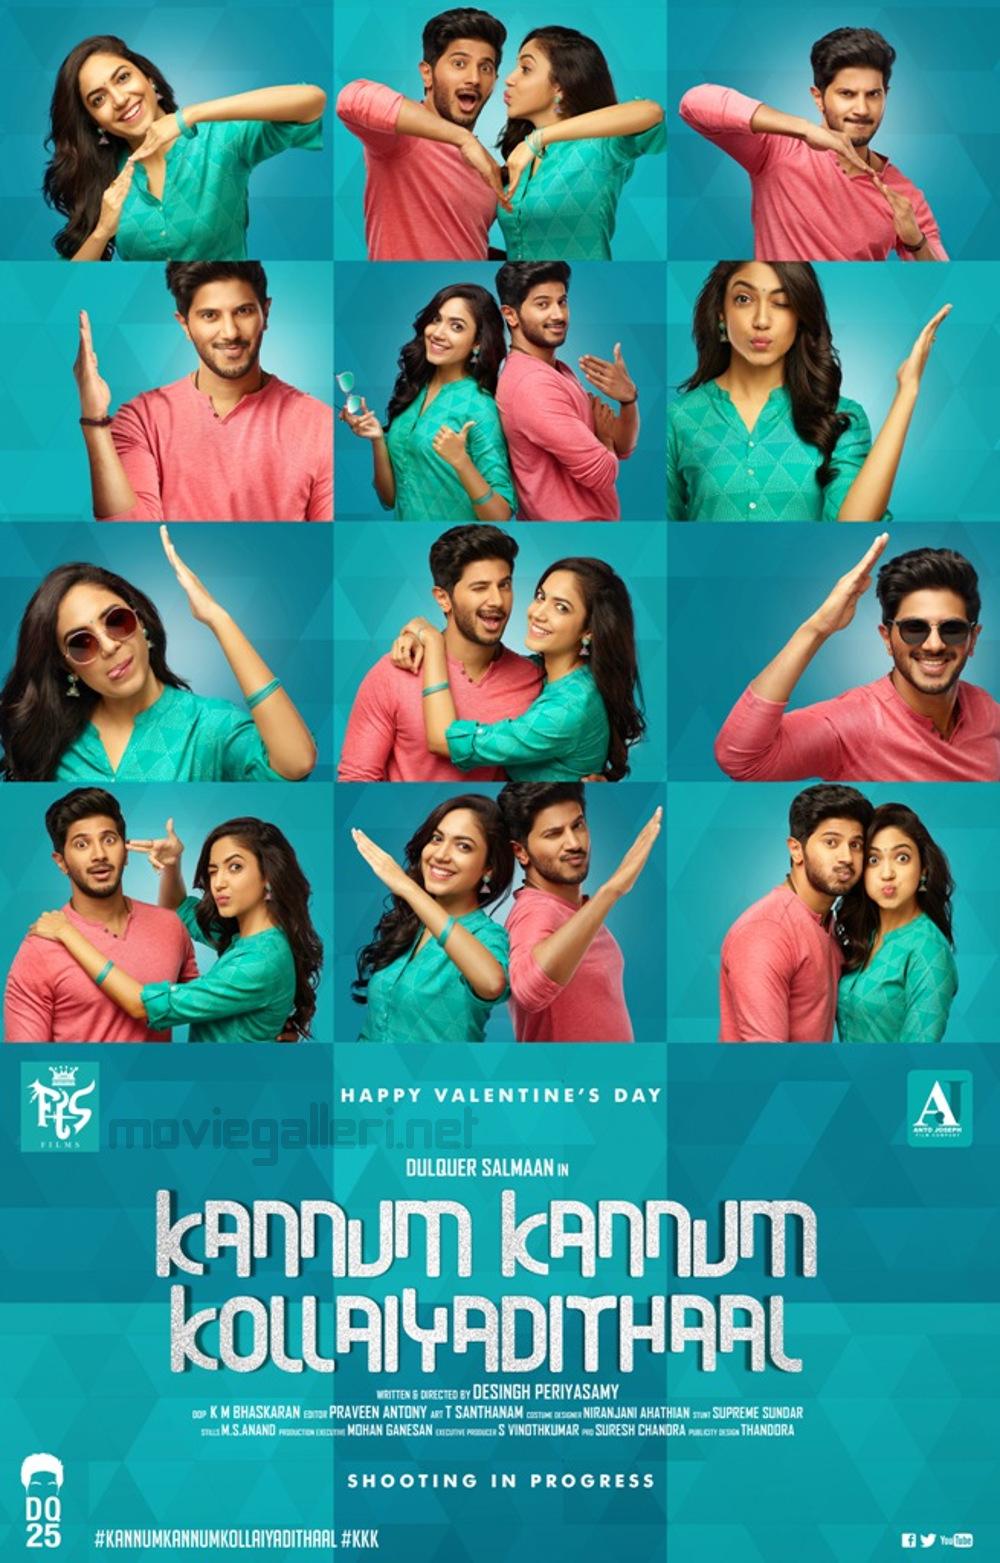 Dulquer Salmaan Ritu Verma Kannum Kannum Kollai Adithal First Look Poster